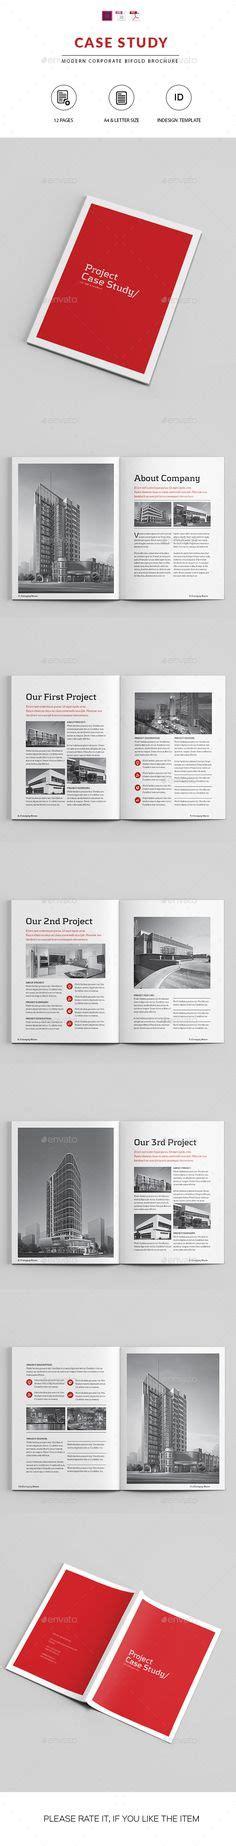 indesign study template study templates lander graphic design freebies